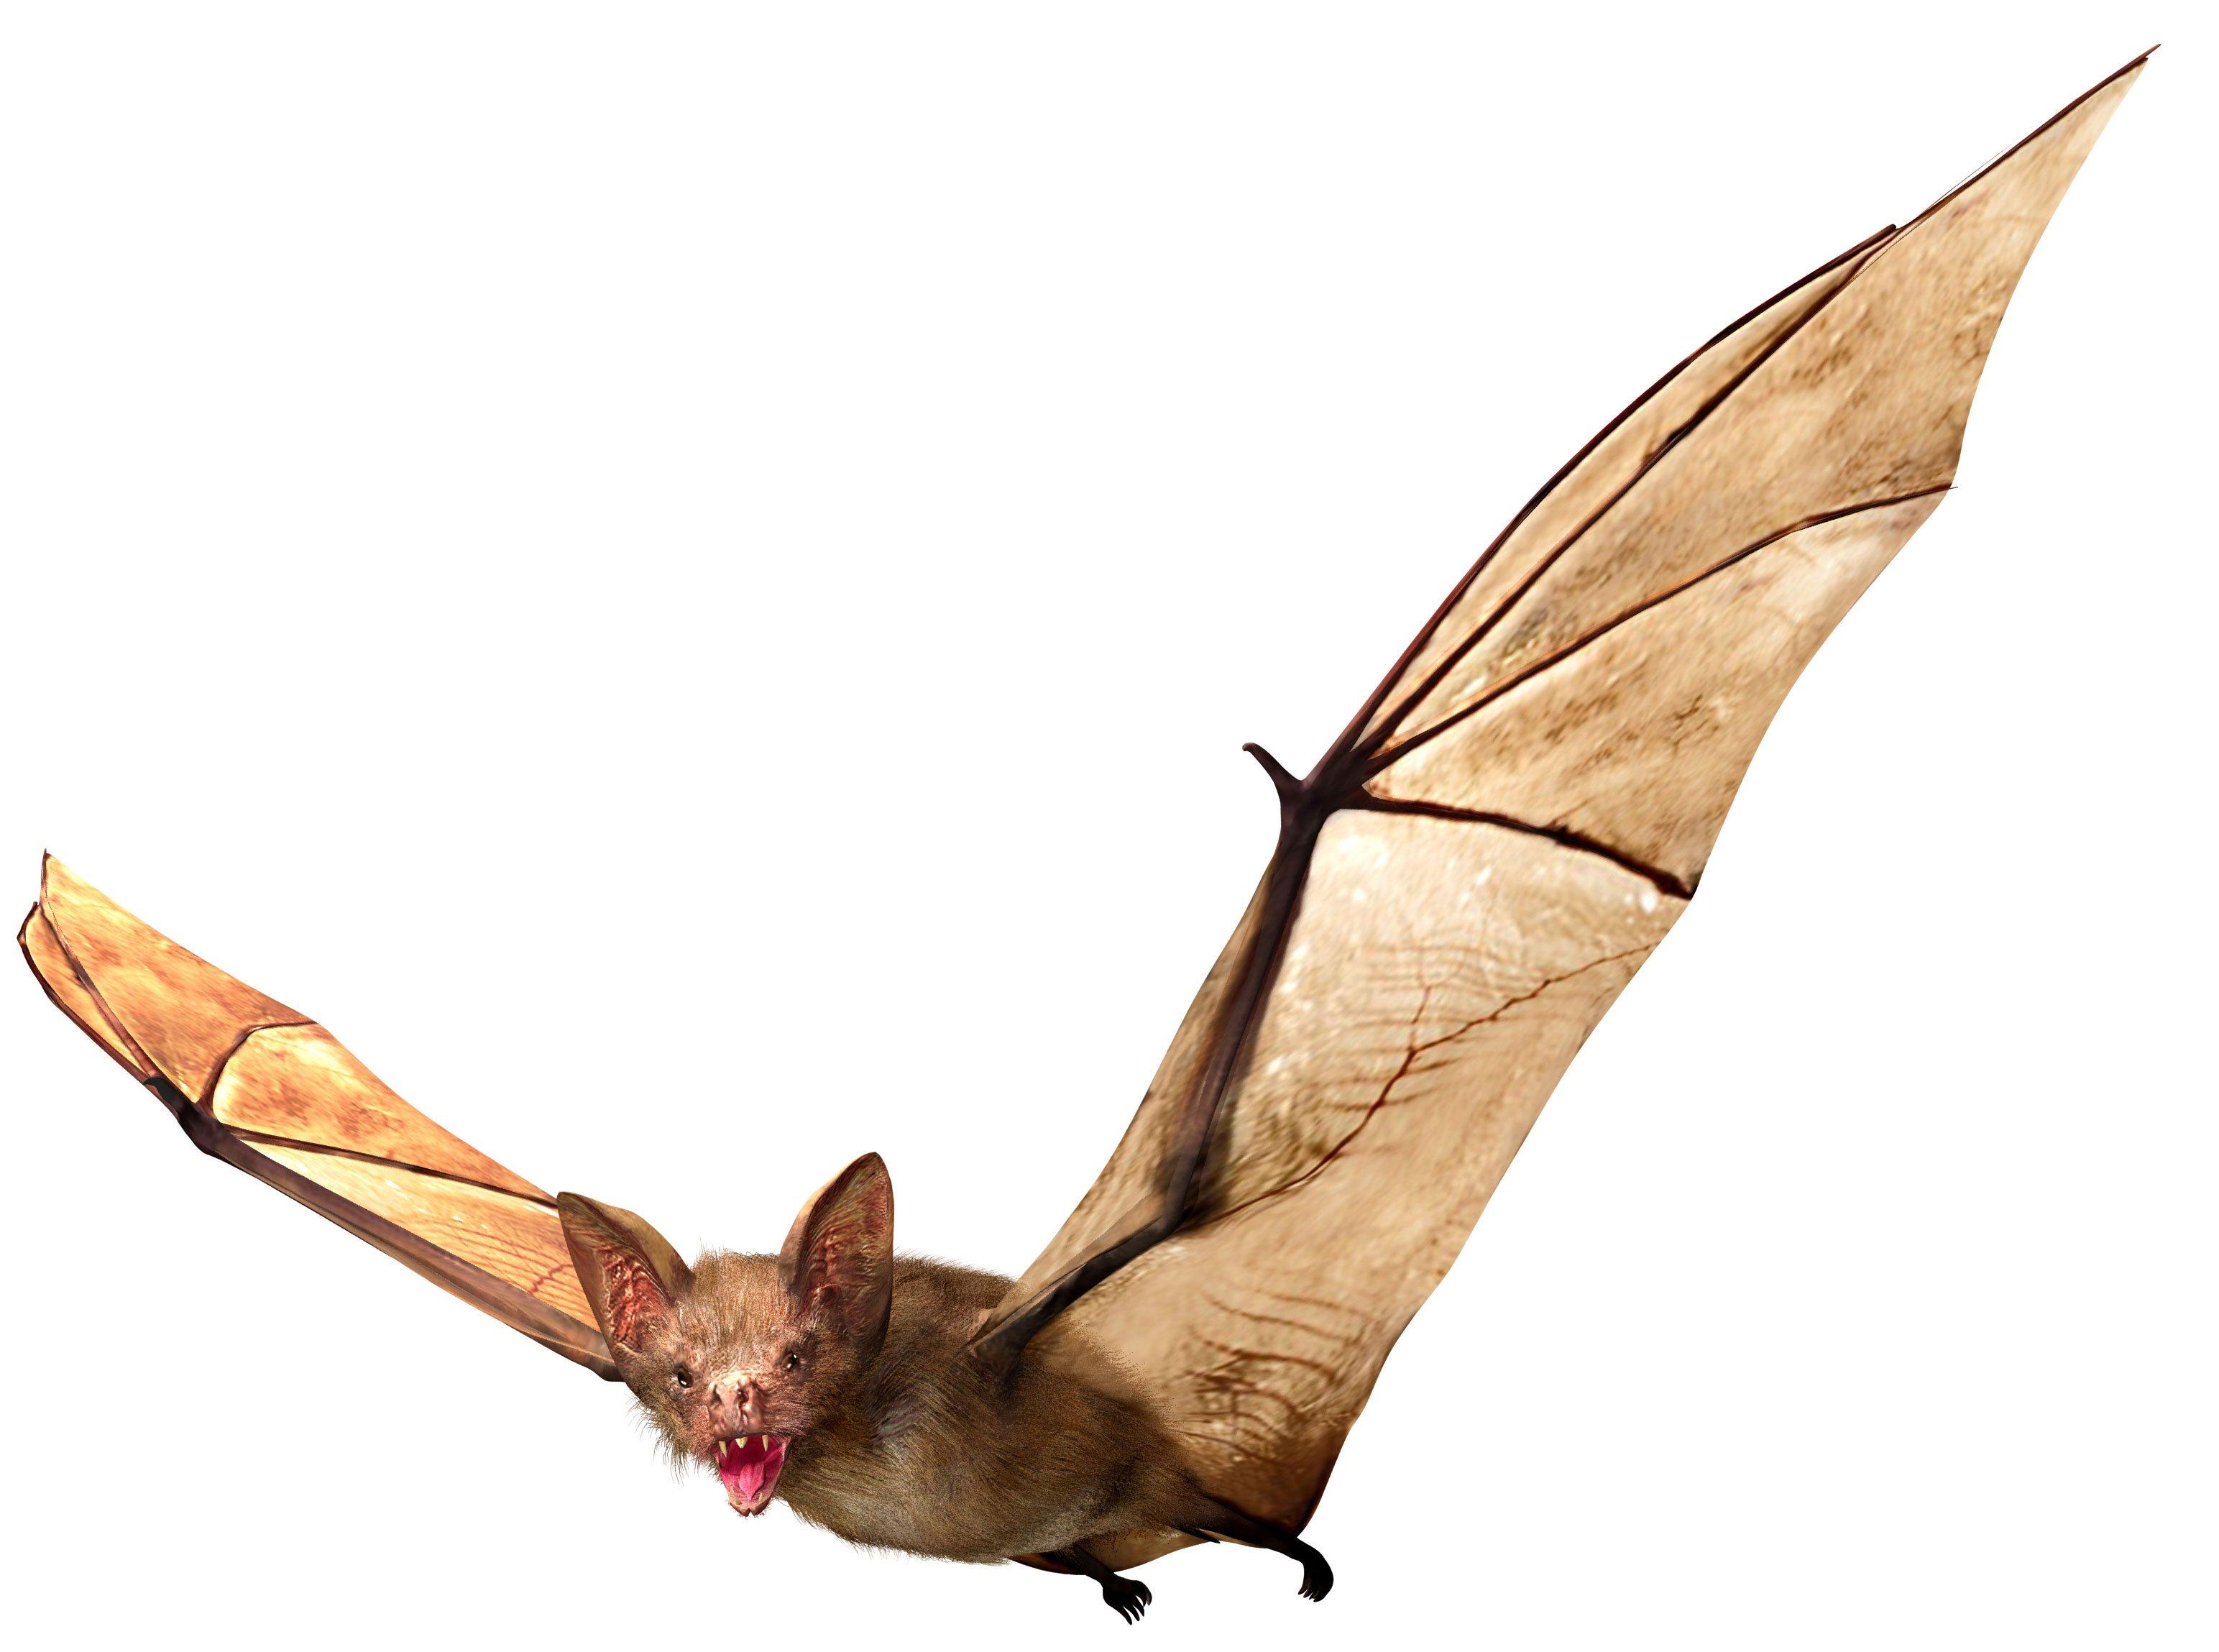 3087x2298 Bat Removal Services